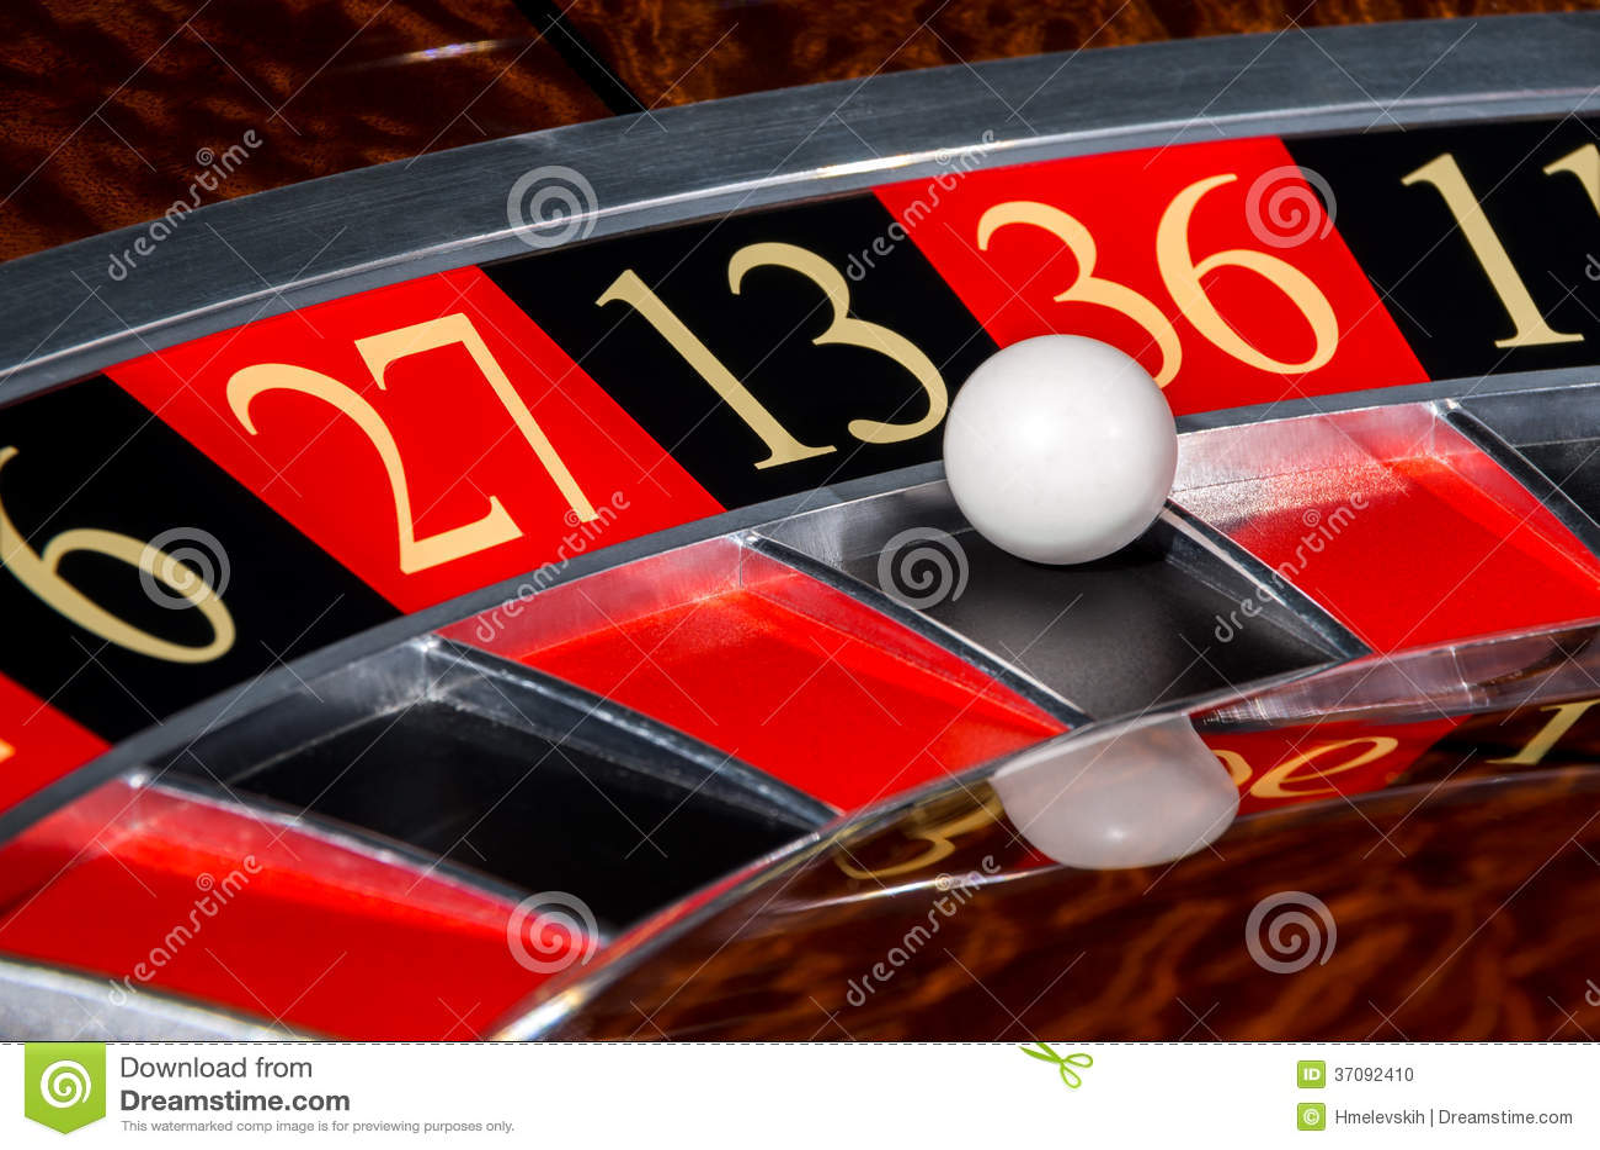 classic roulette casino